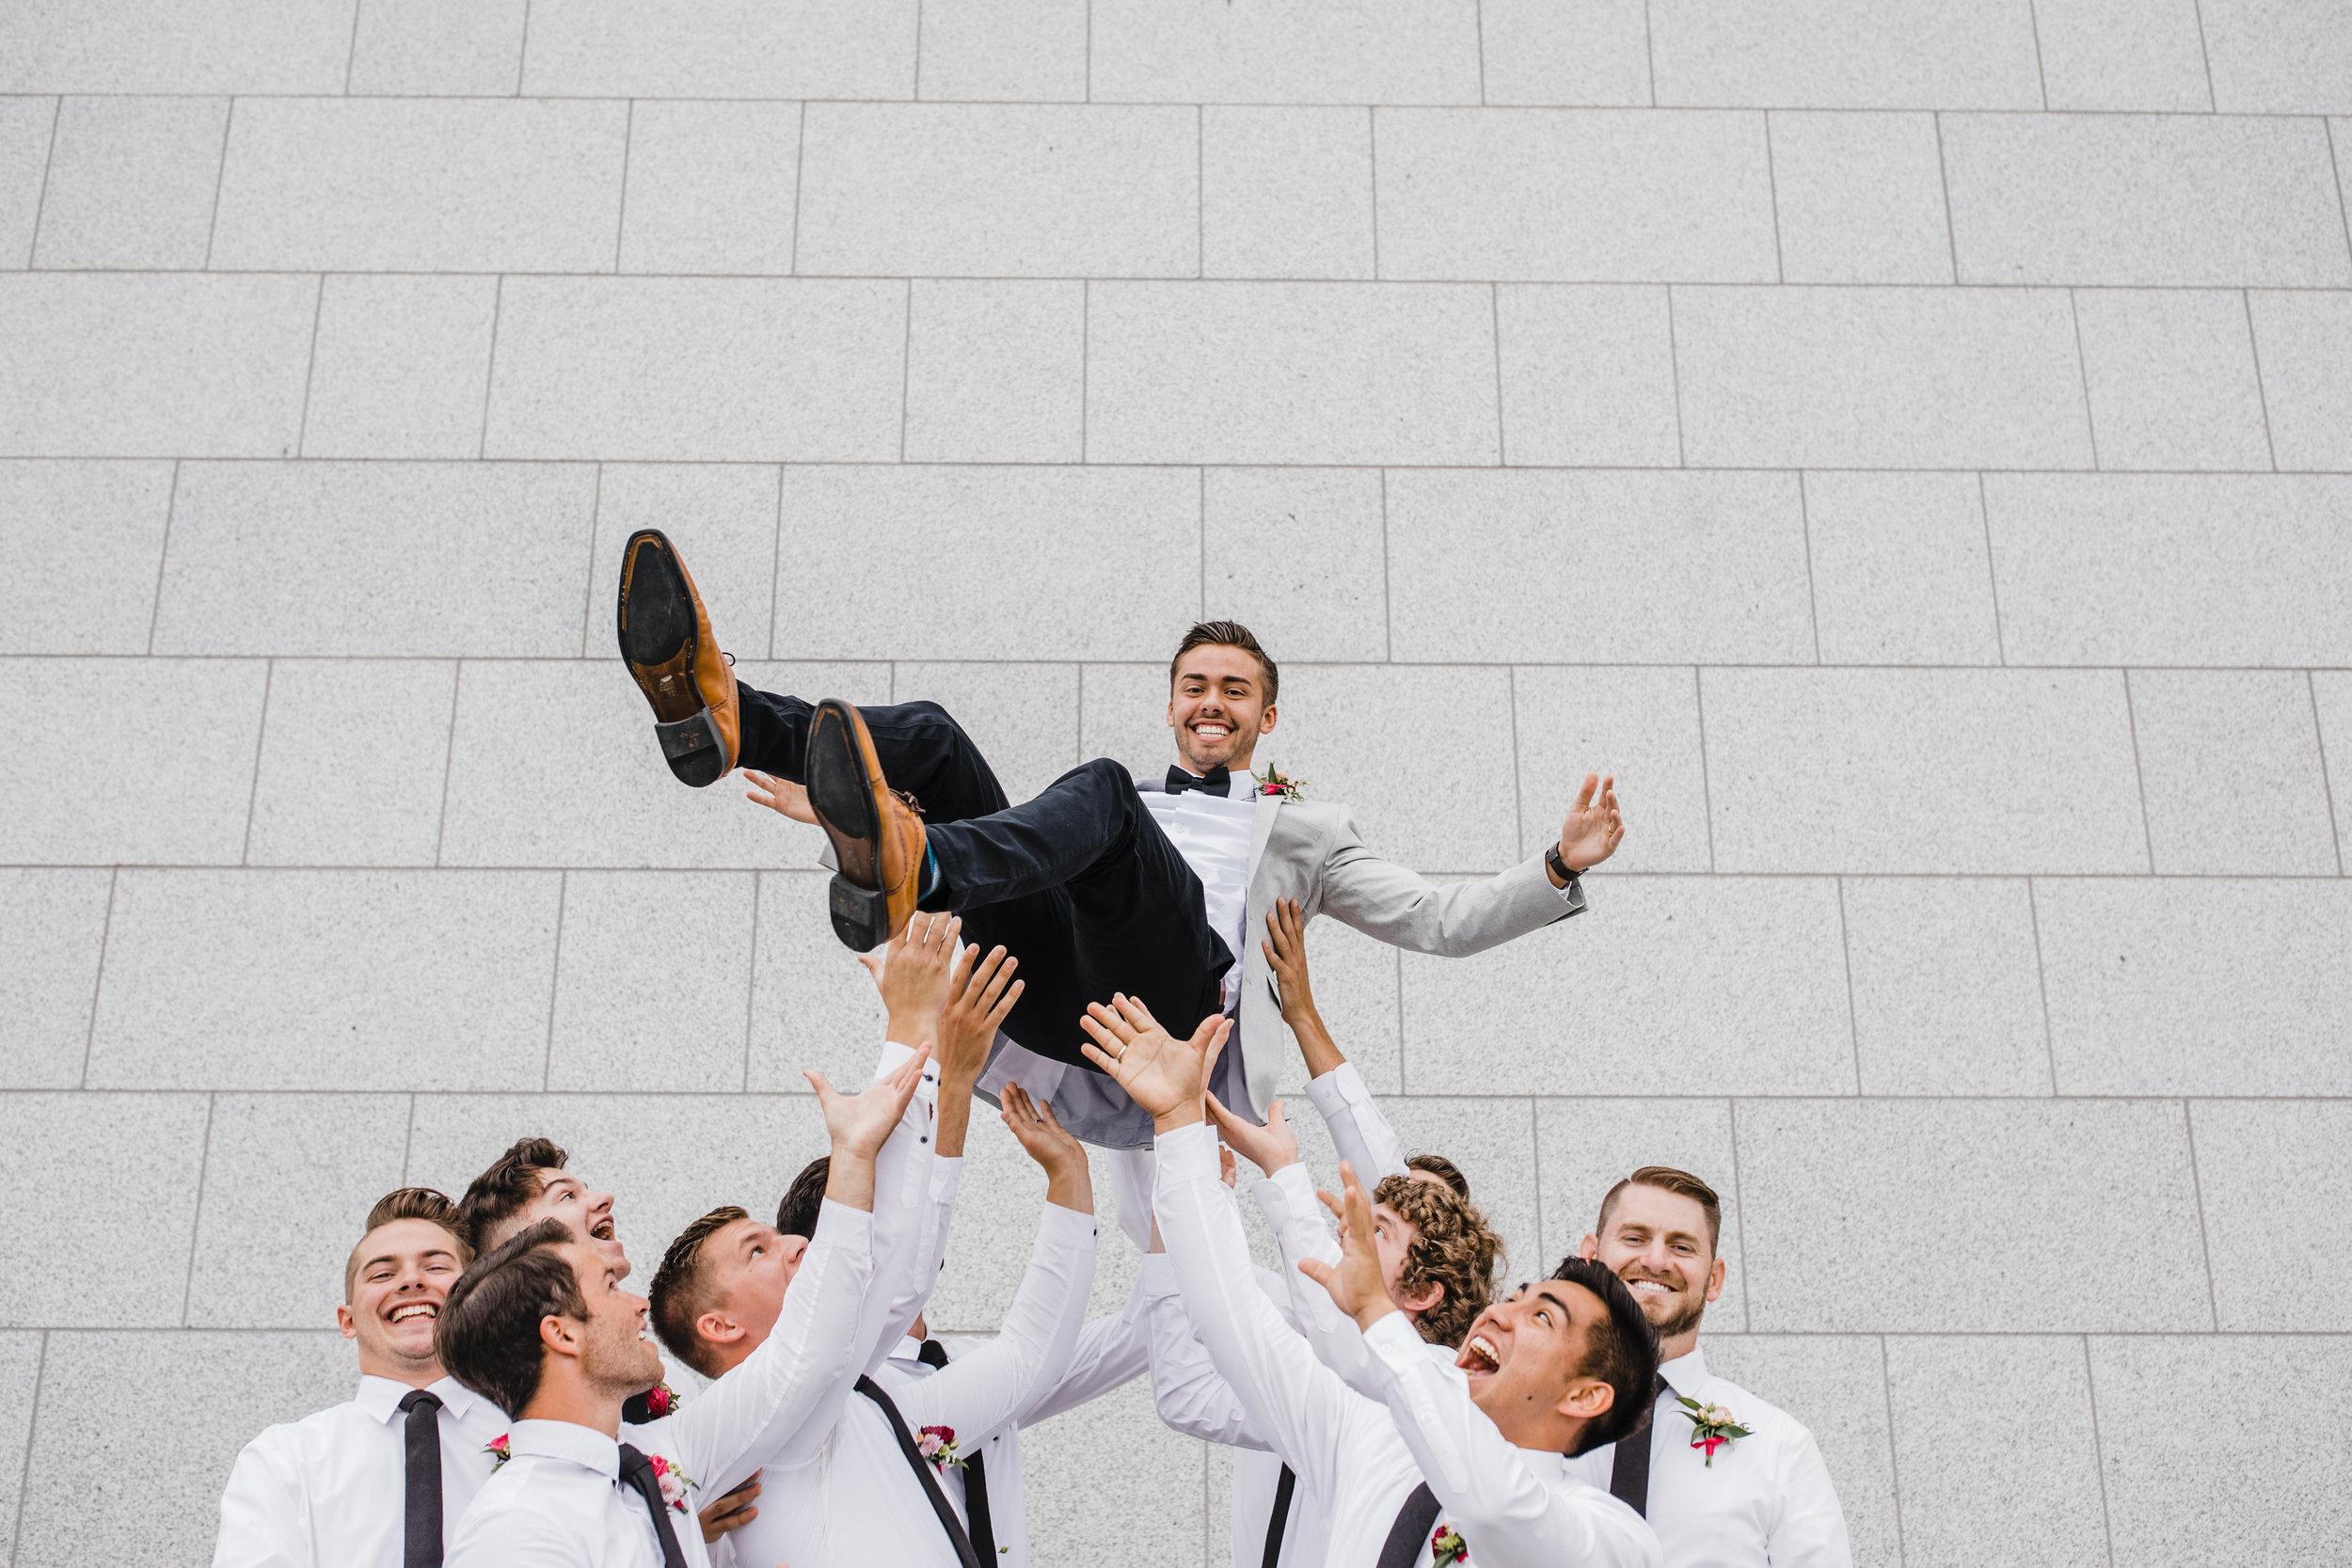 professional wedding photographer in utah valley utah groomsmen lift happy laughing